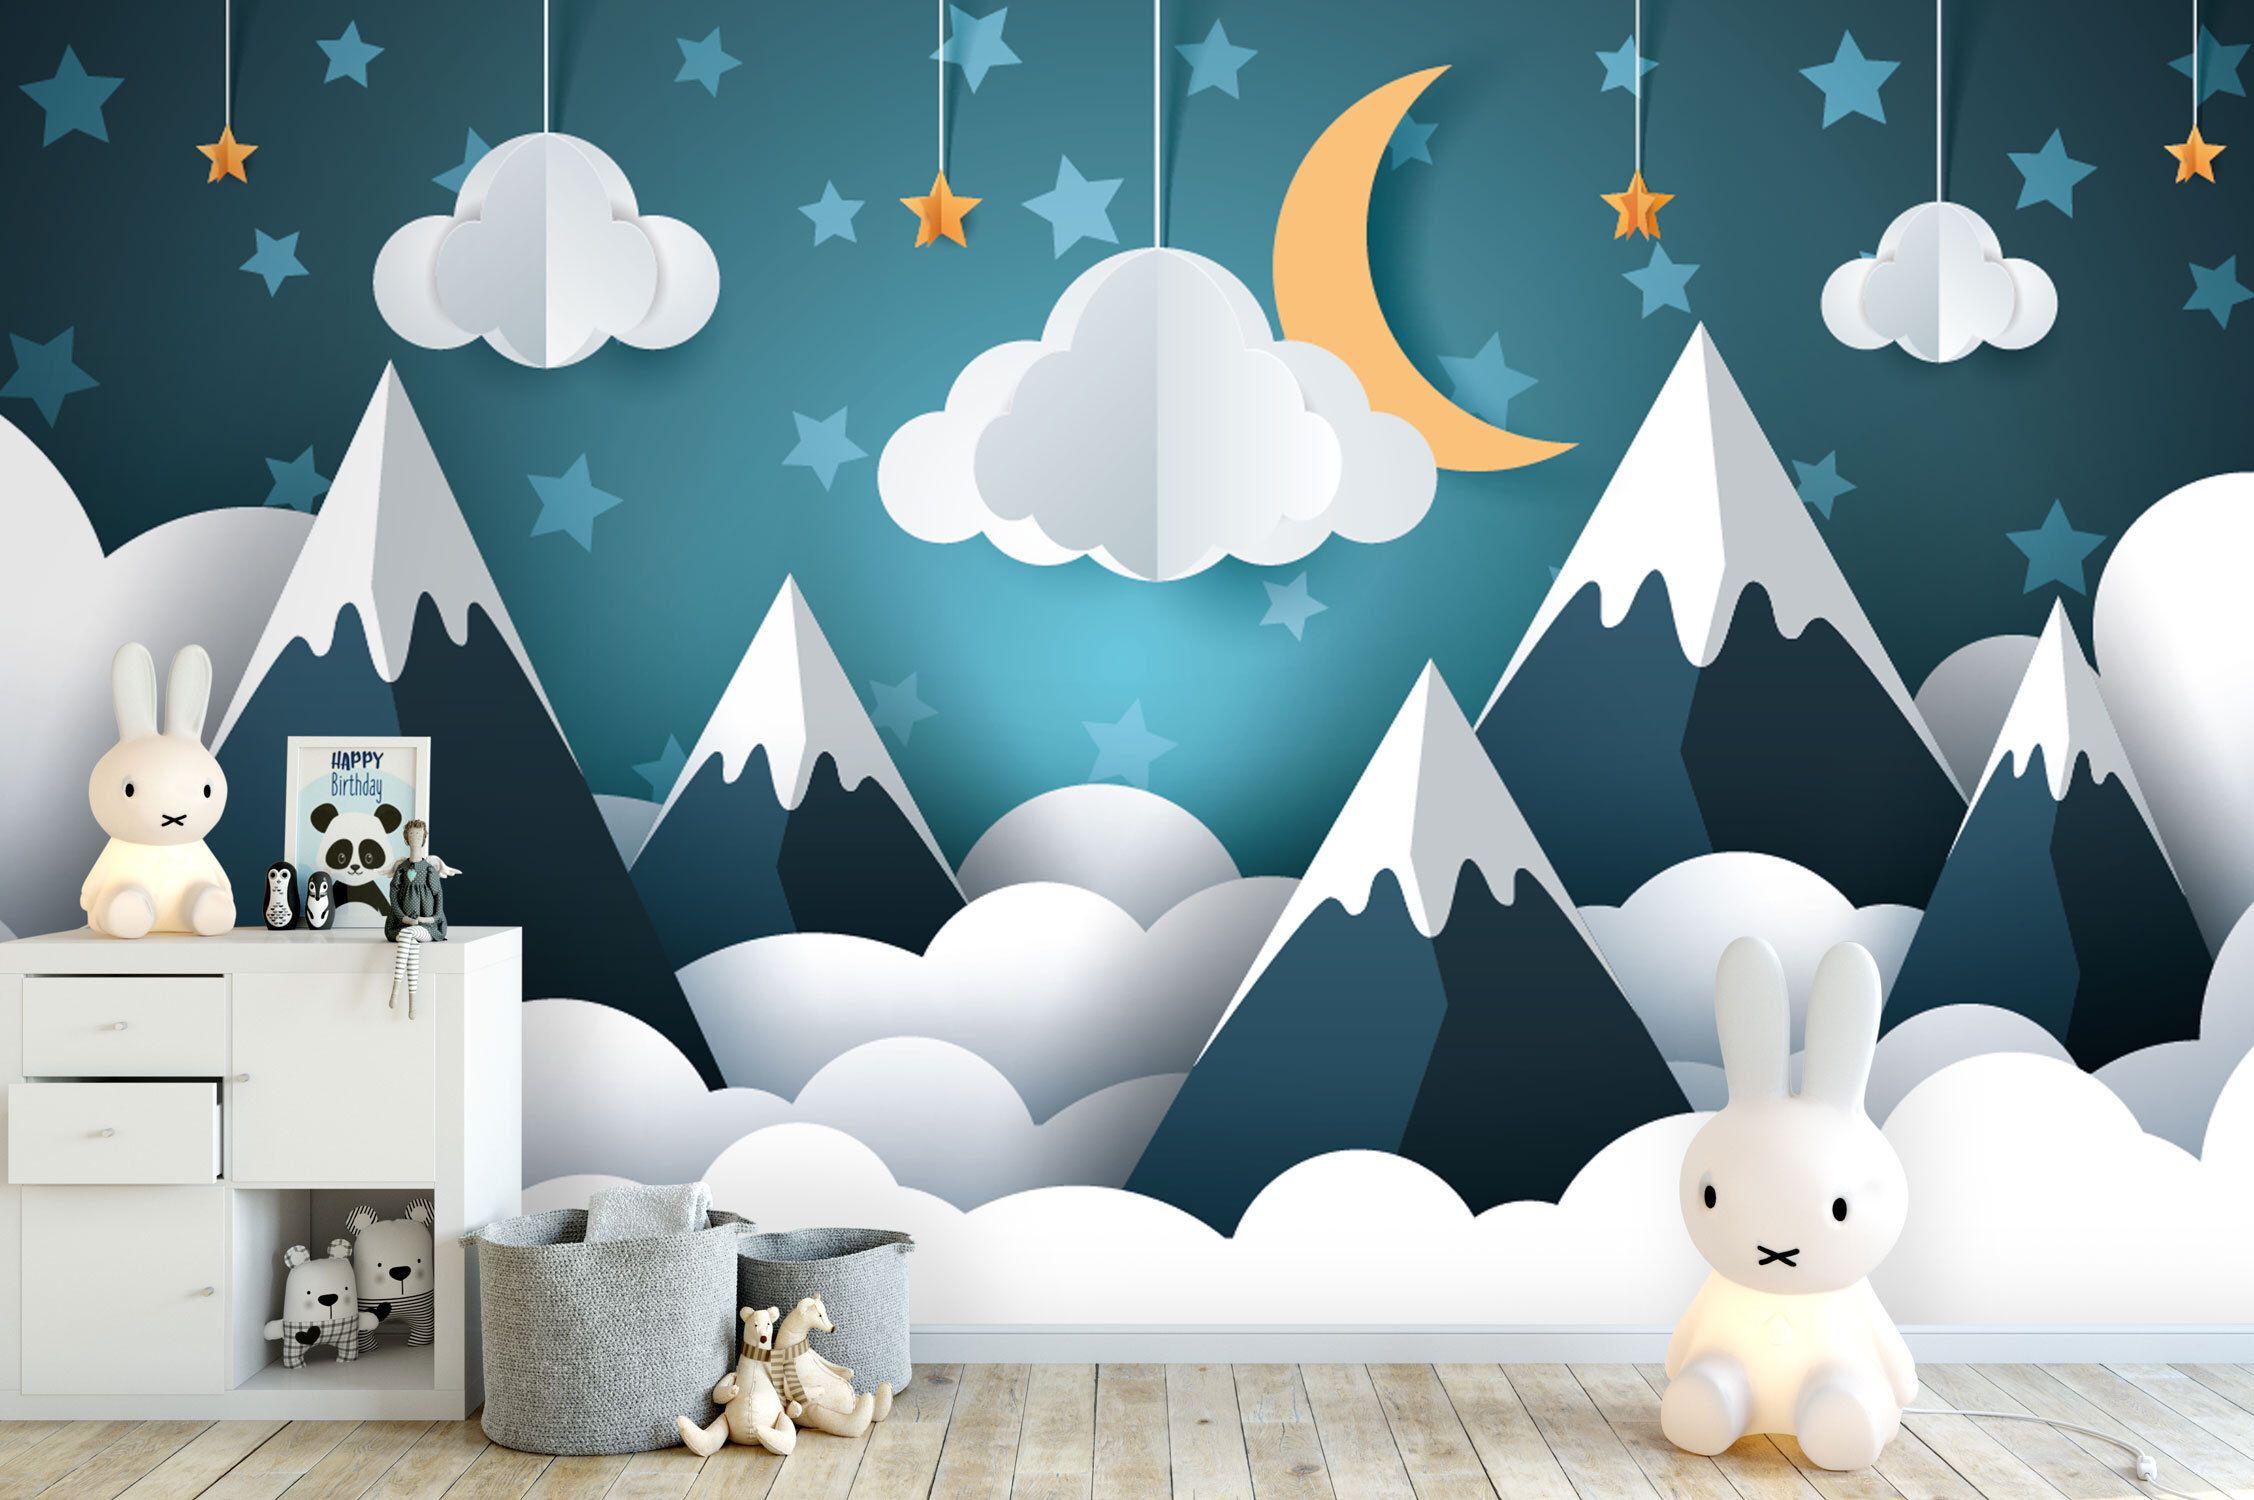 Tapete, Fototapete, Kinderzimmer, Babyzimmer, Berge, Mond ...